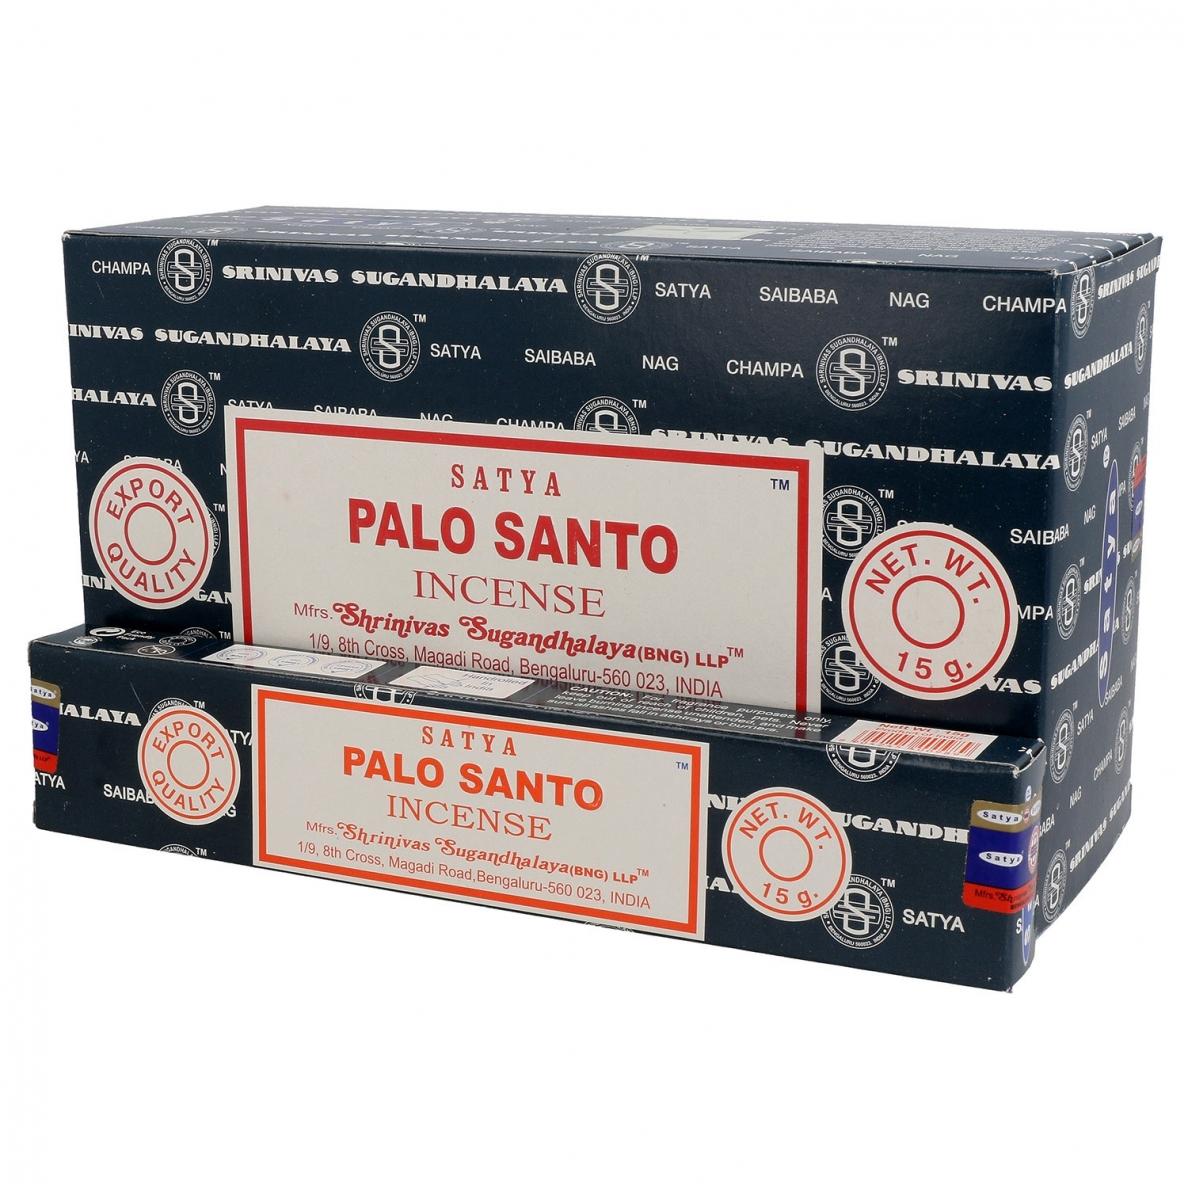 viiruk Satya Palo Santo Incense, 15g (2509)